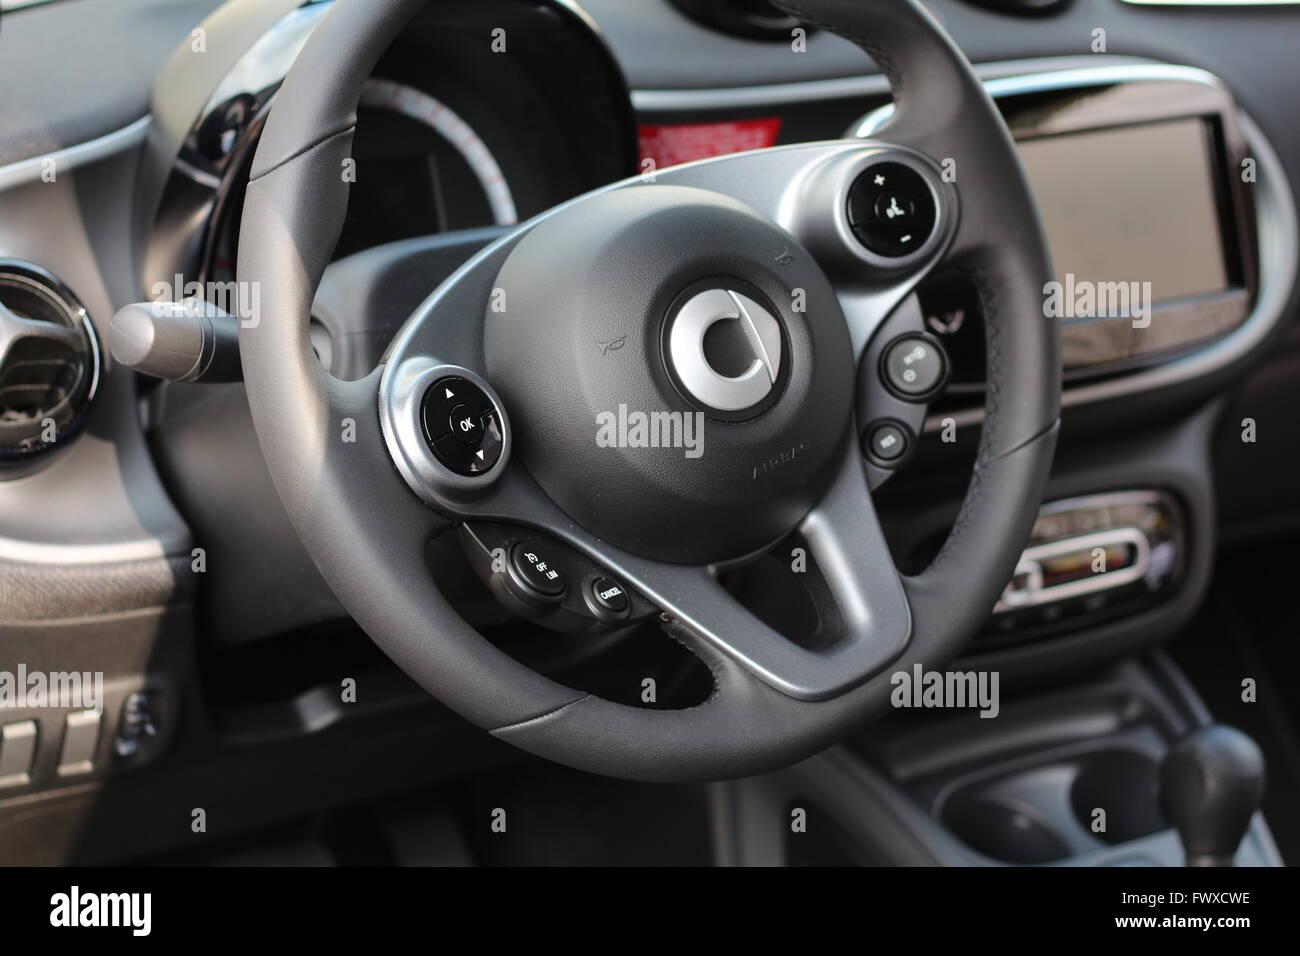 cockpit of a smart car - Stock Image